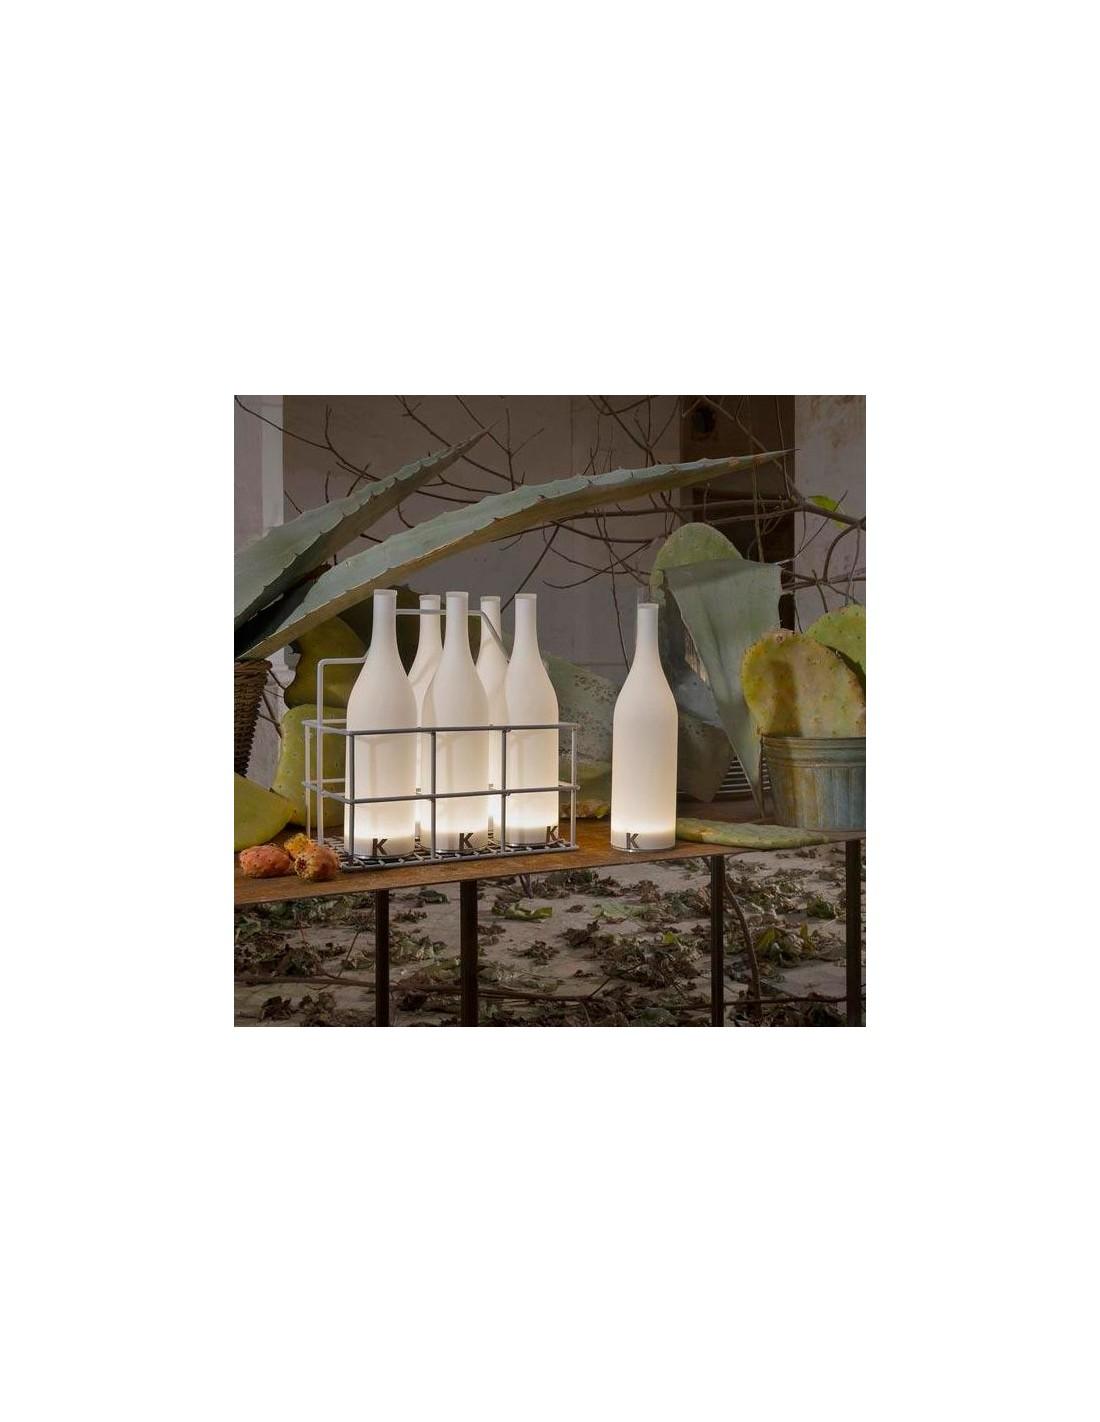 lampe poser sans fil bacco vue show room de chez karman. Black Bedroom Furniture Sets. Home Design Ideas